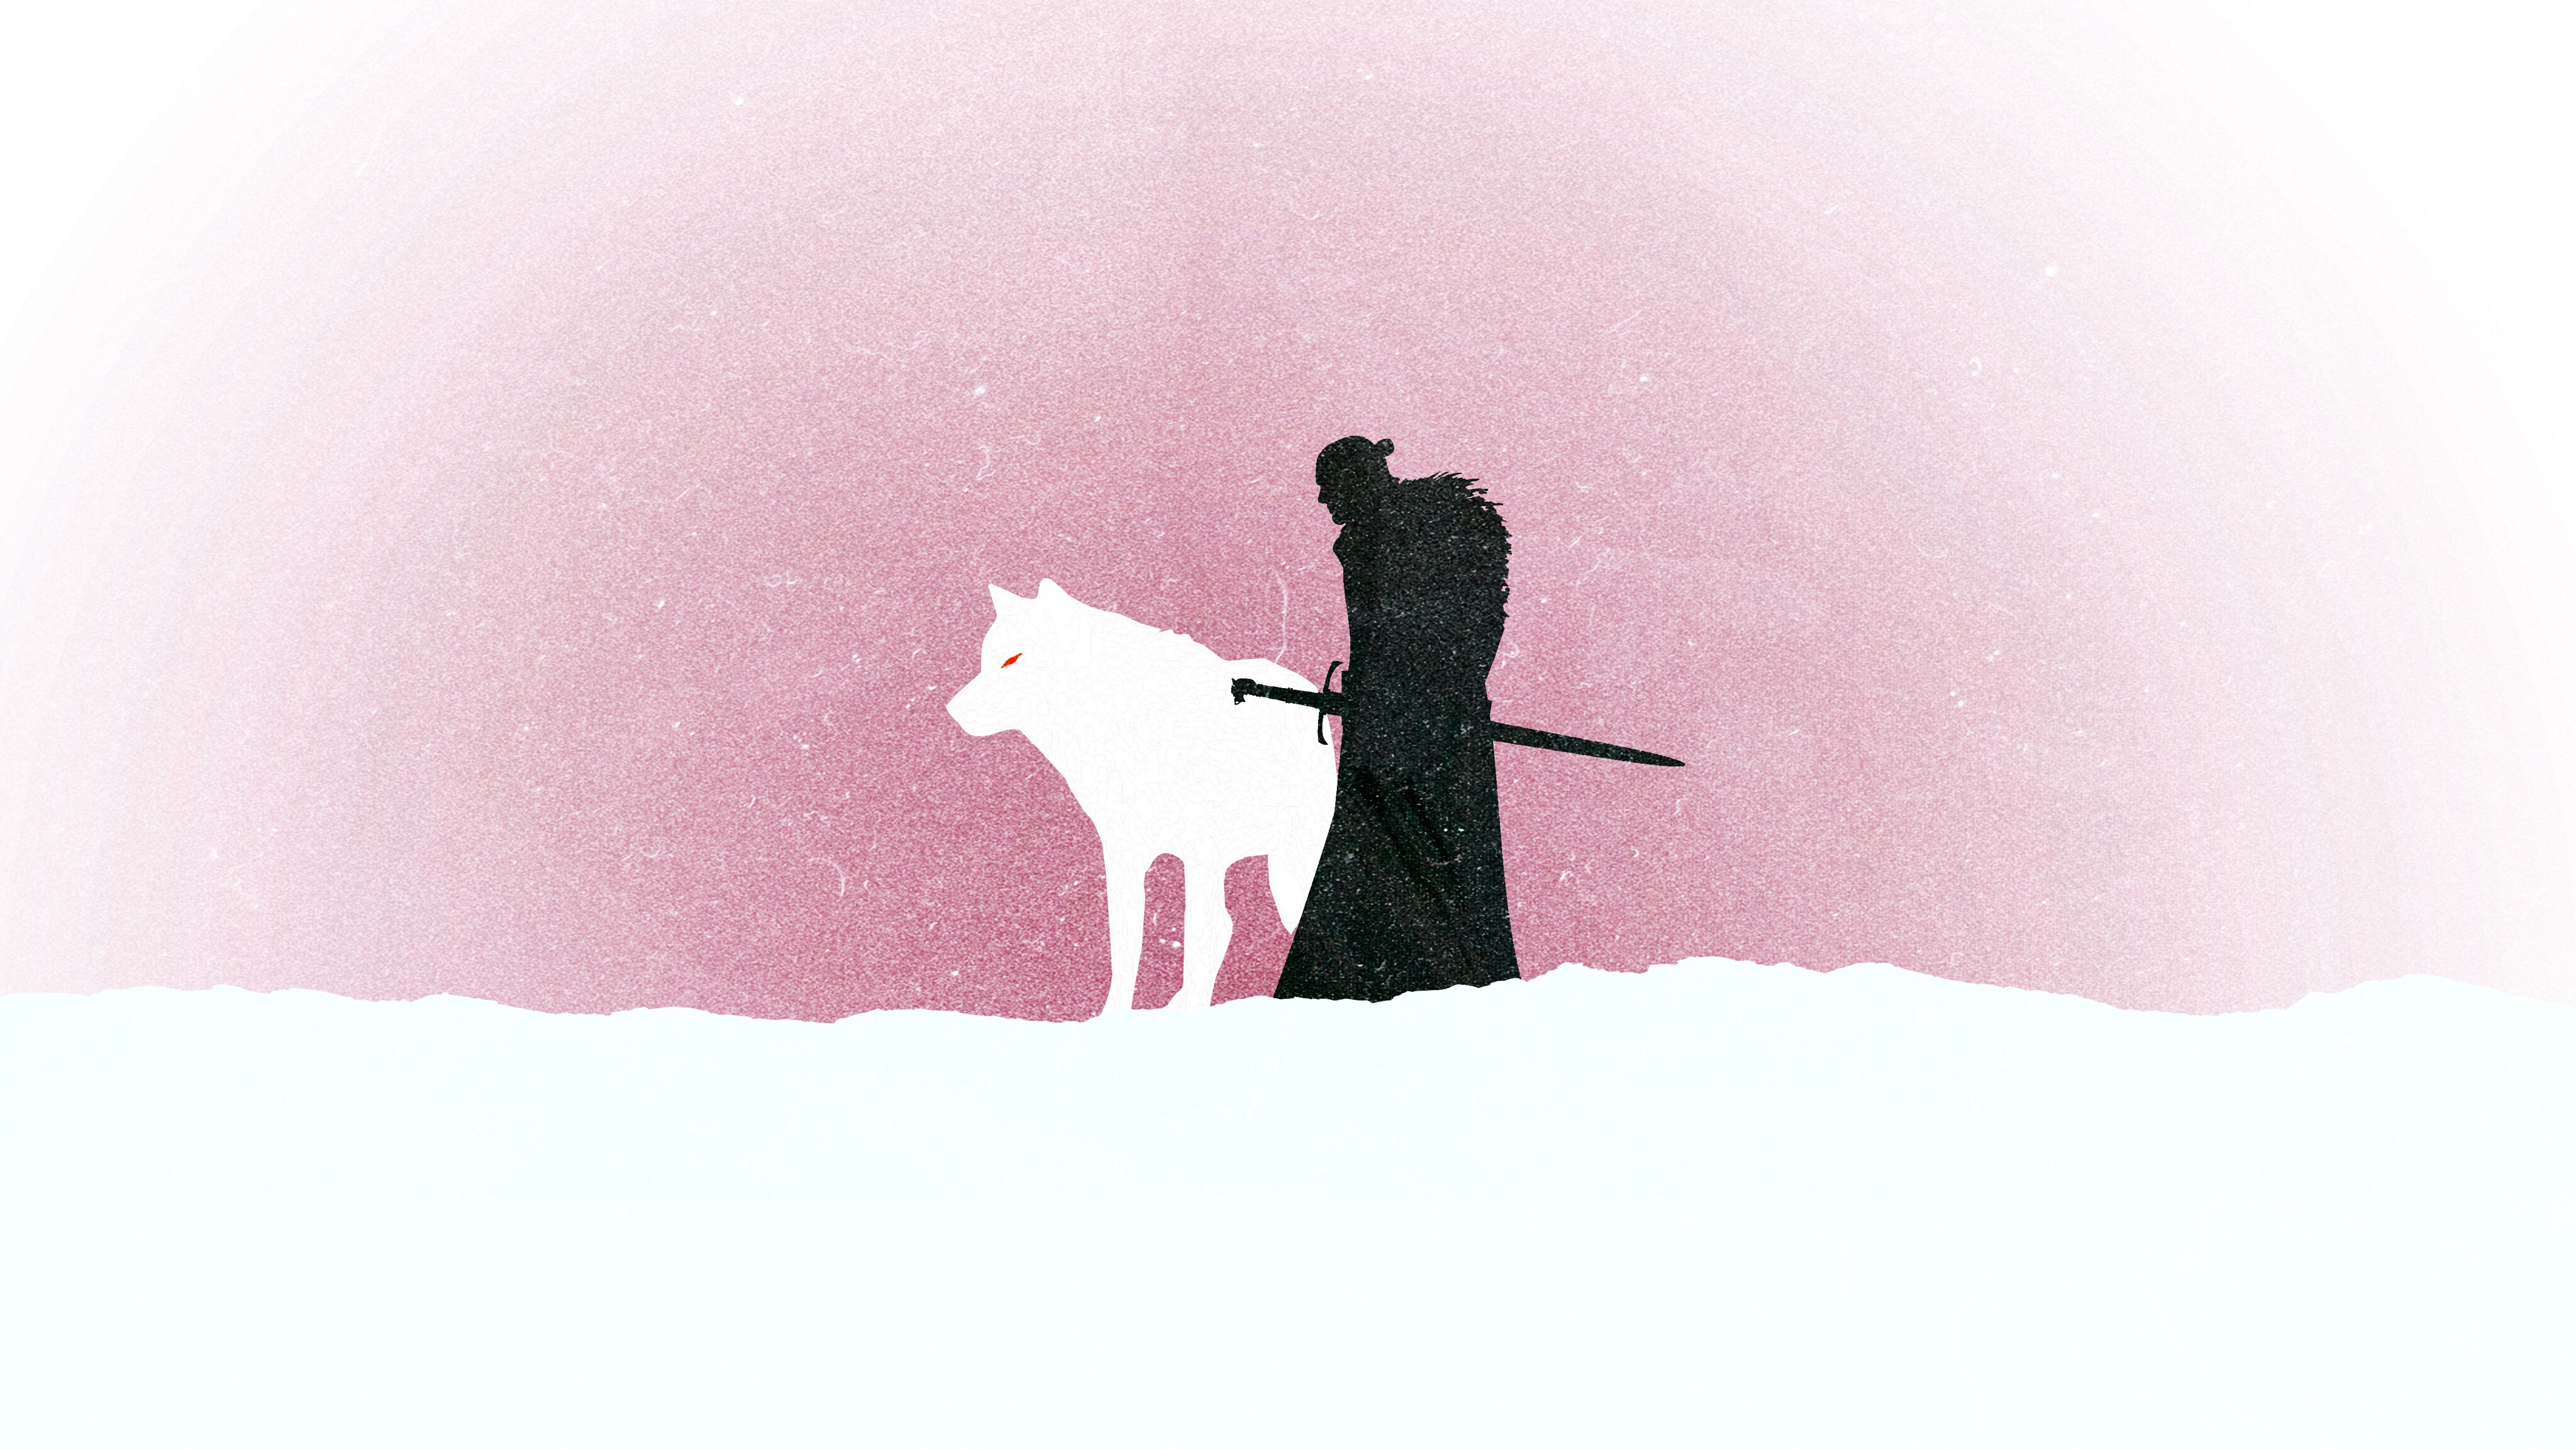 Jon Snow Game Of Thrones Minimalism Hd Tv Shows 4k Wallpapers